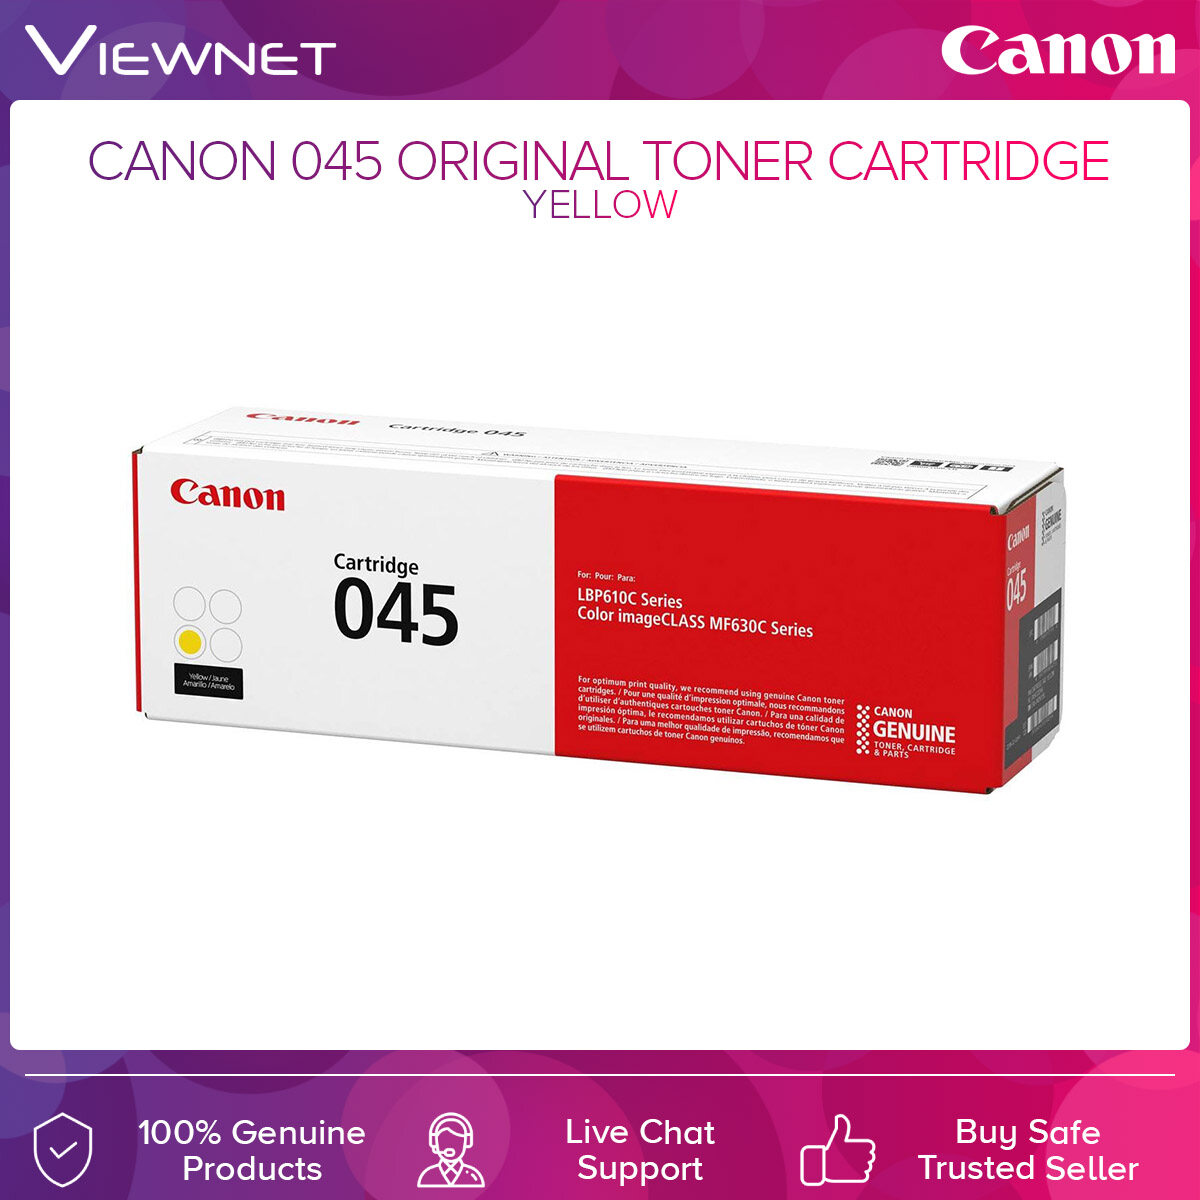 Canon 045 ORIGINAL TONER CARTRIDGE Black  Cyan  Magenta  Yellow